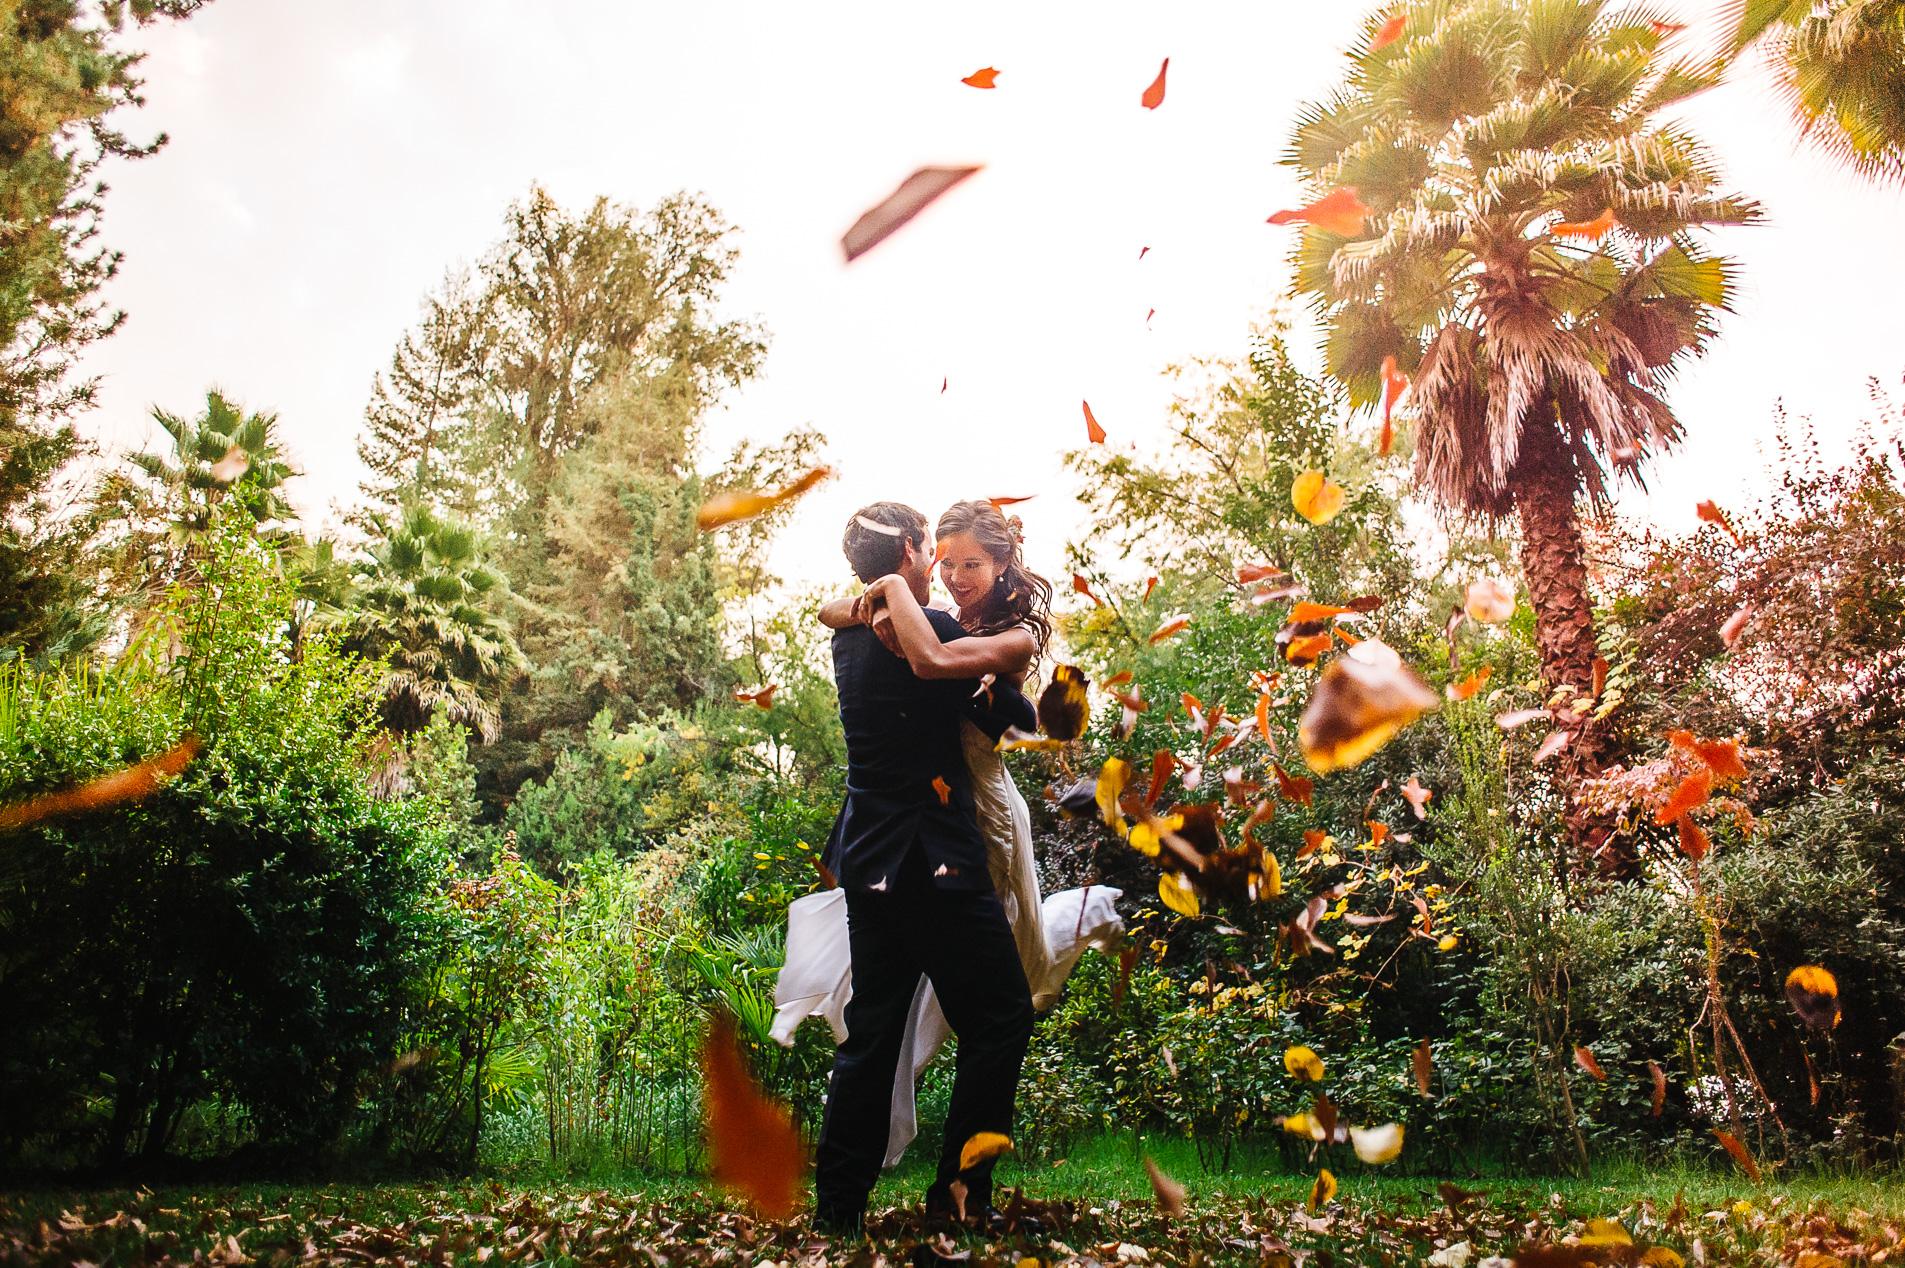 Pacita-Diego-matrimonio-otoño-34